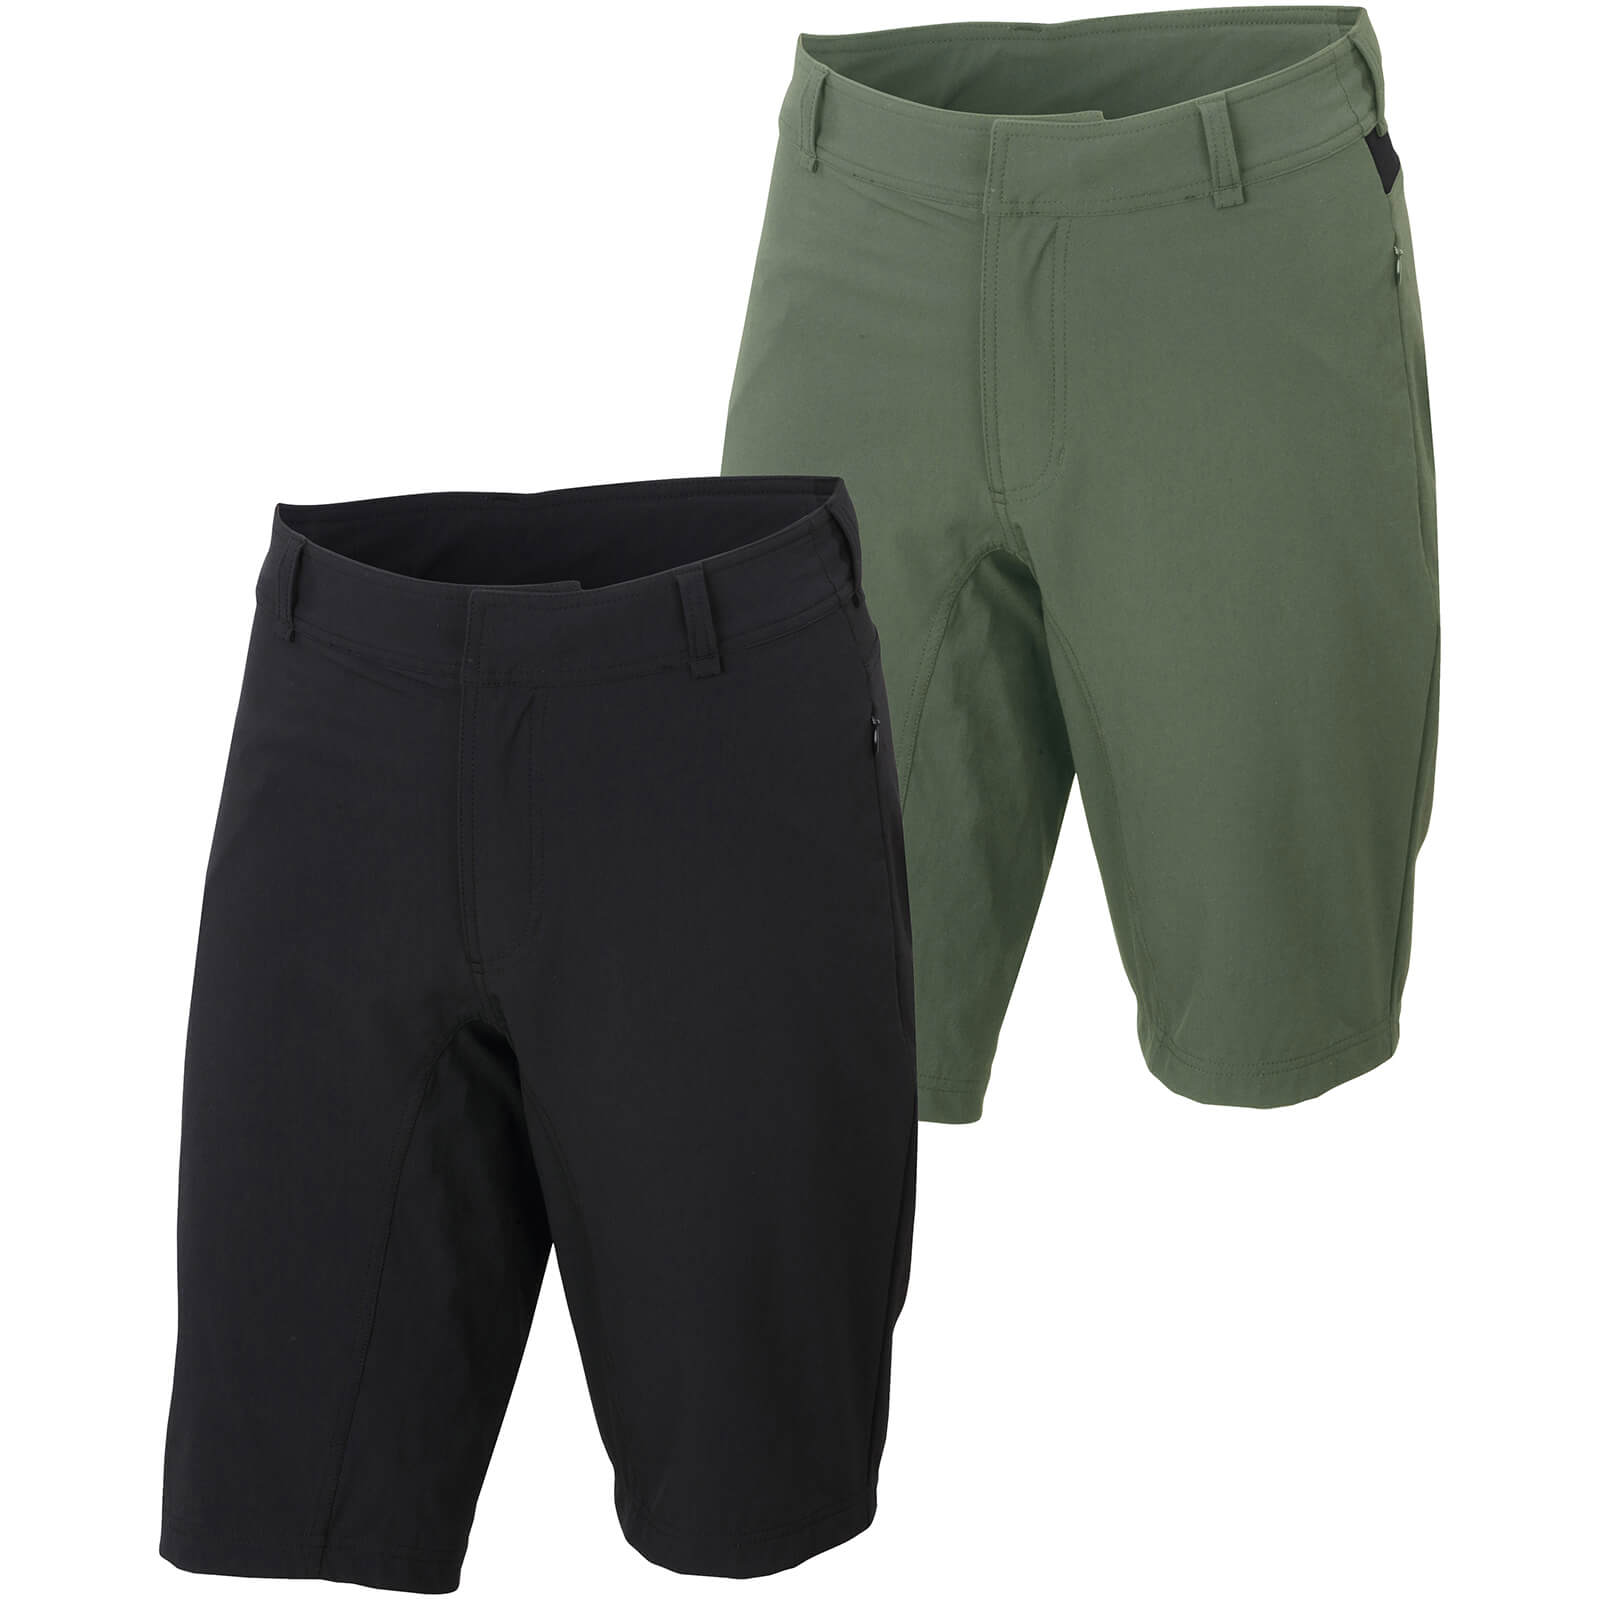 Sportful Giara Over Shorts - L - Black